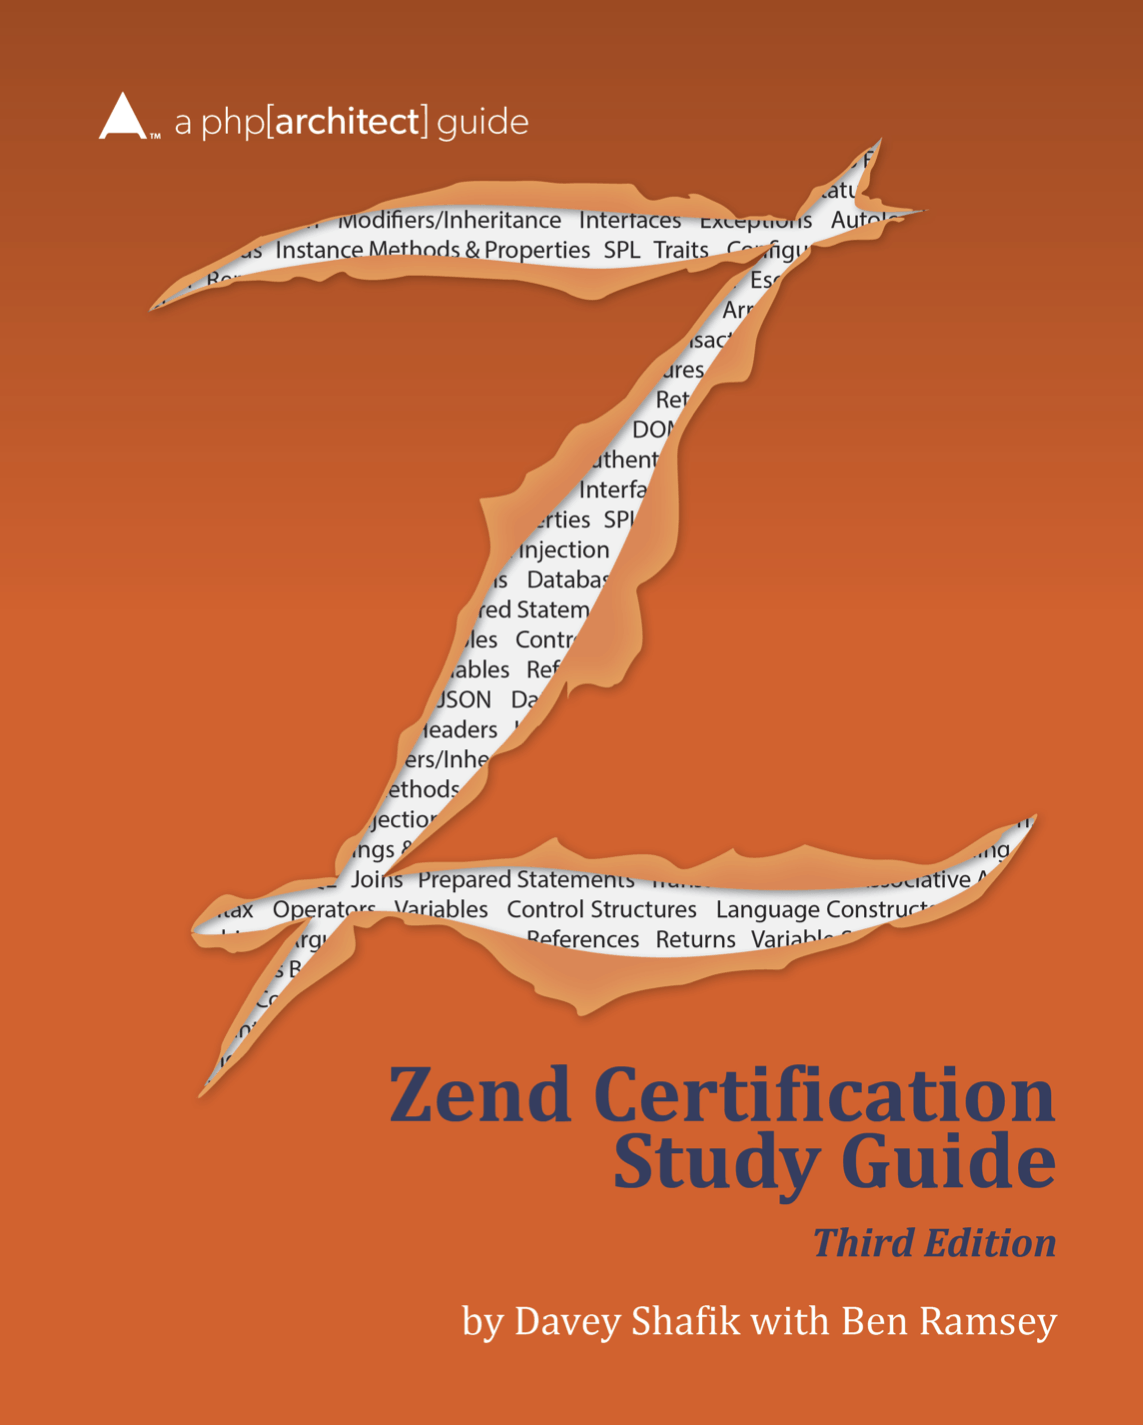 Zend Certification Study Guide 3rd Edition Davey Shafik